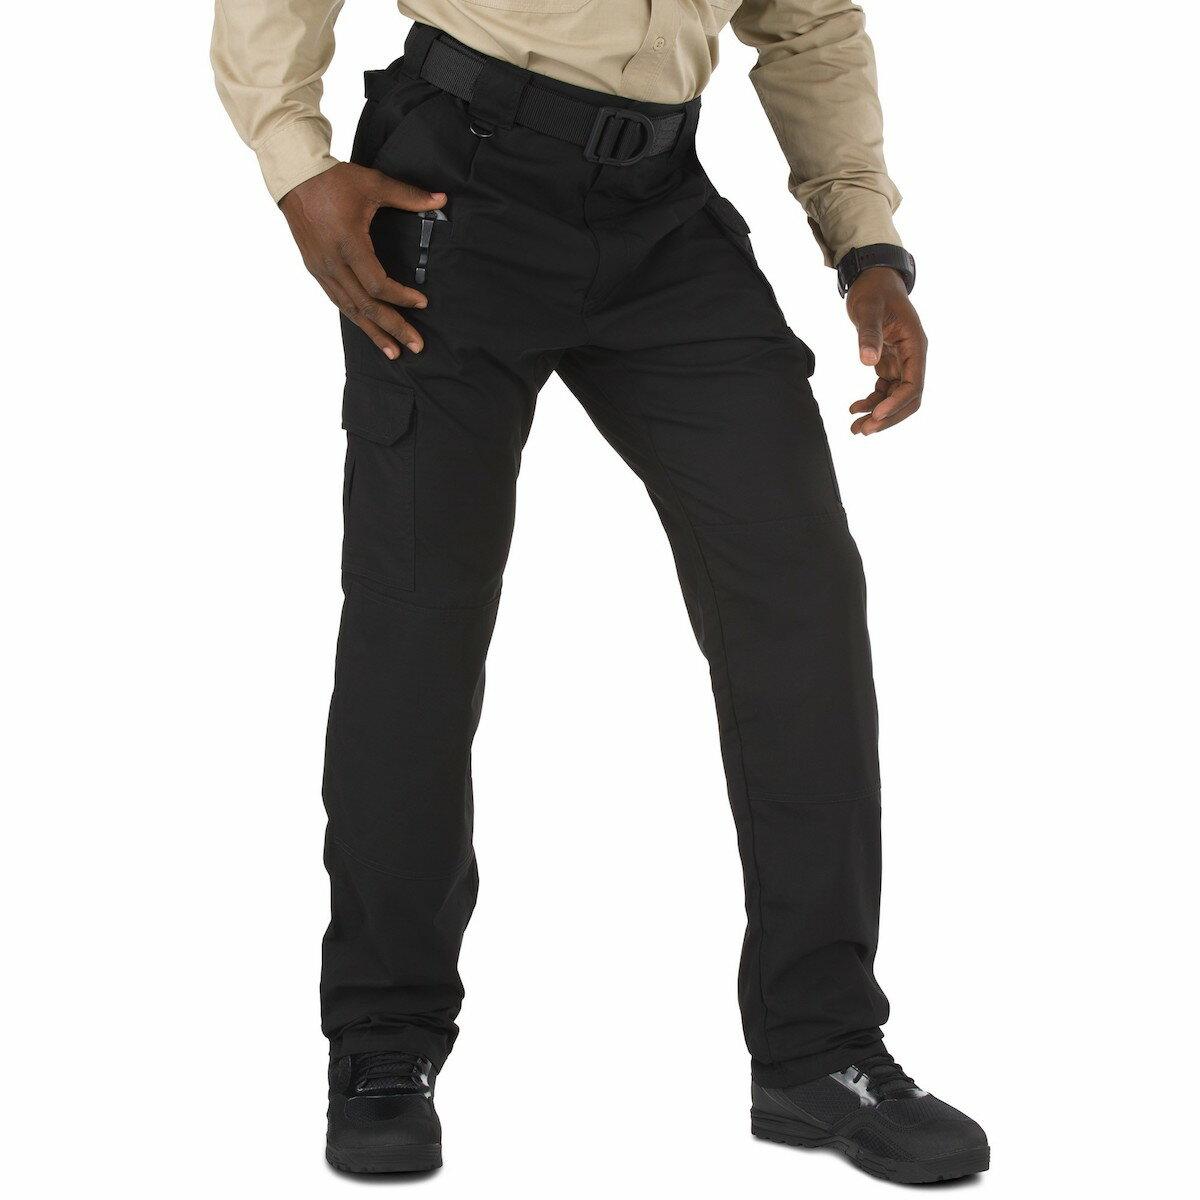 【10%OFFクーポン対象】5.11 TACLITE PRO PANT タクティカル パンツ L32W30 74273 BK サバイバルゲーム サバゲー ミリタリー 戦闘服 迷彩服 メンズ ボトムス